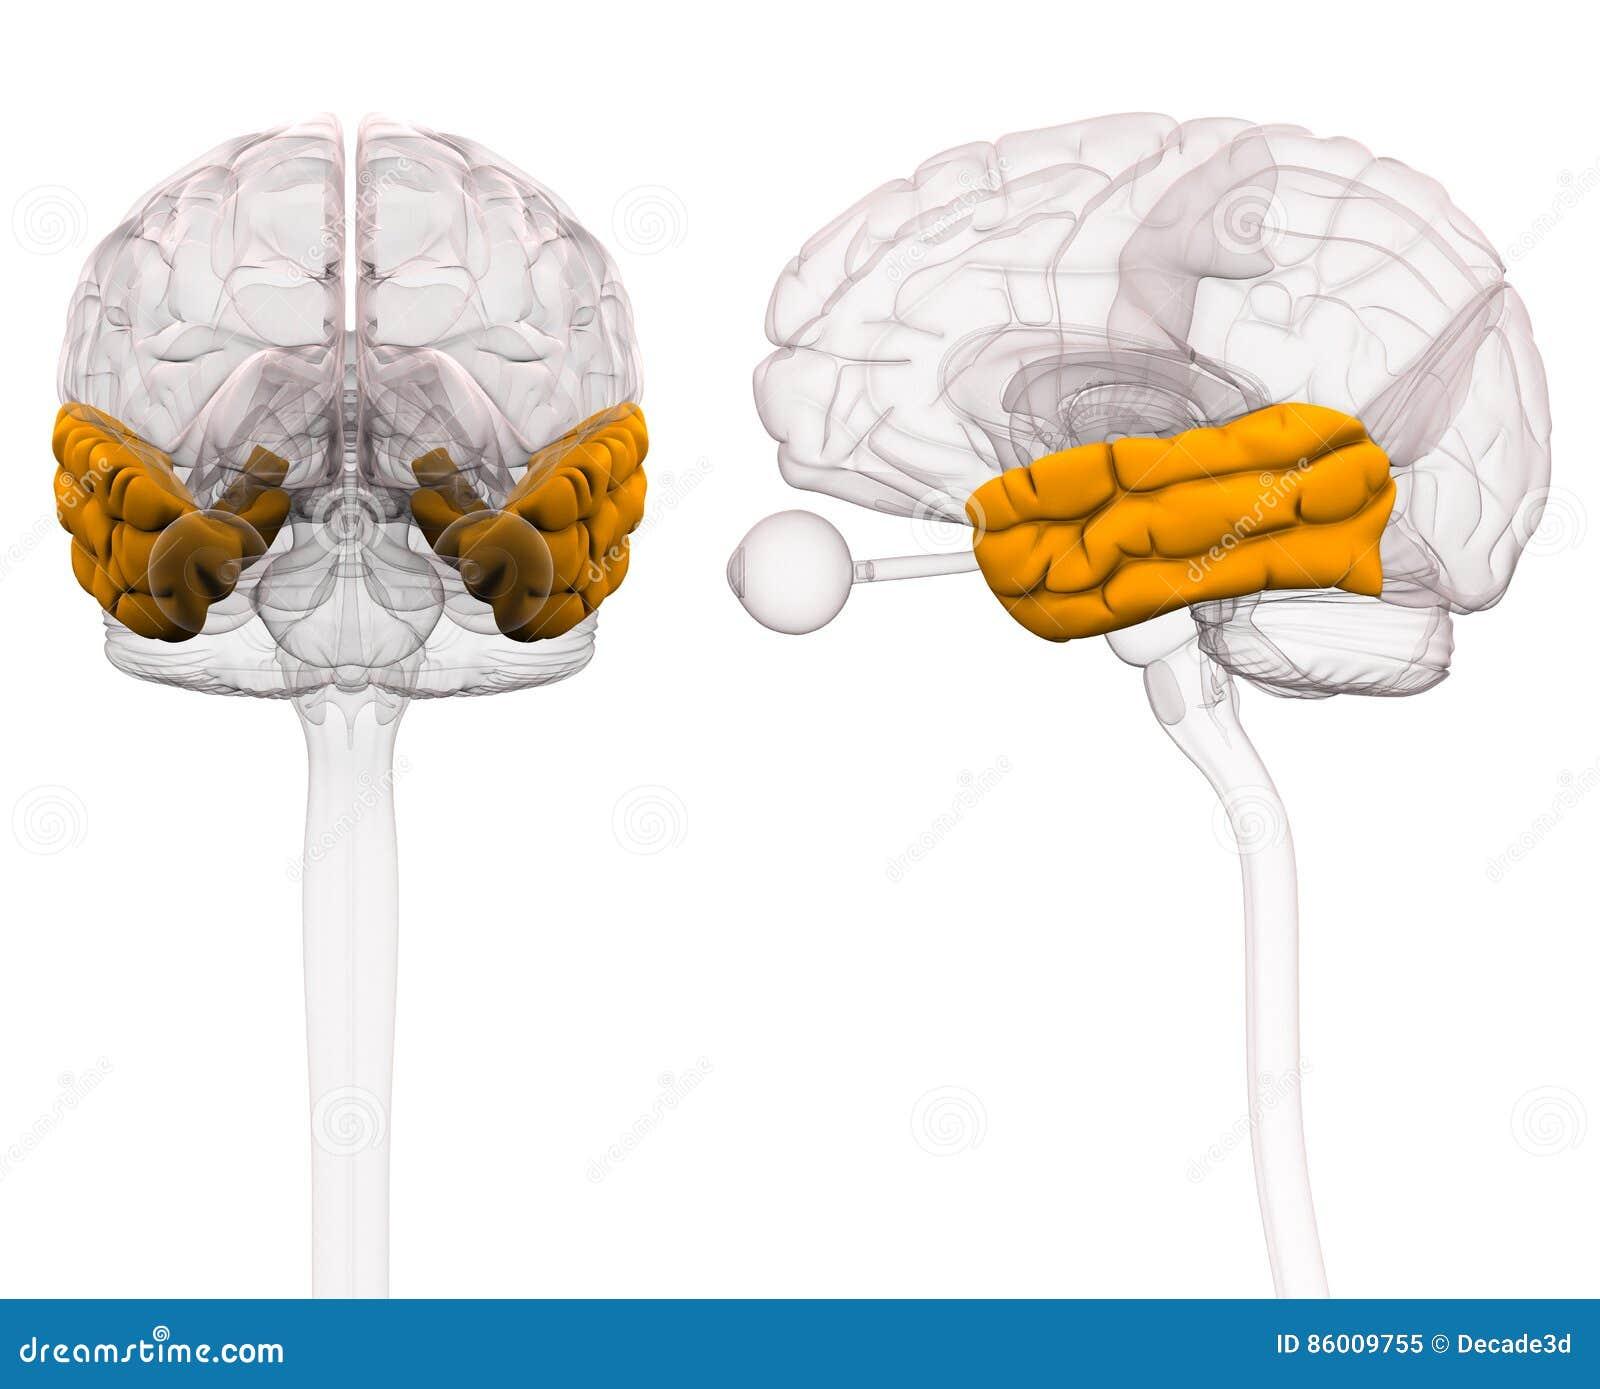 Temporal Lobe Brain Anatomy - 3d Illustration Stock Illustration ...